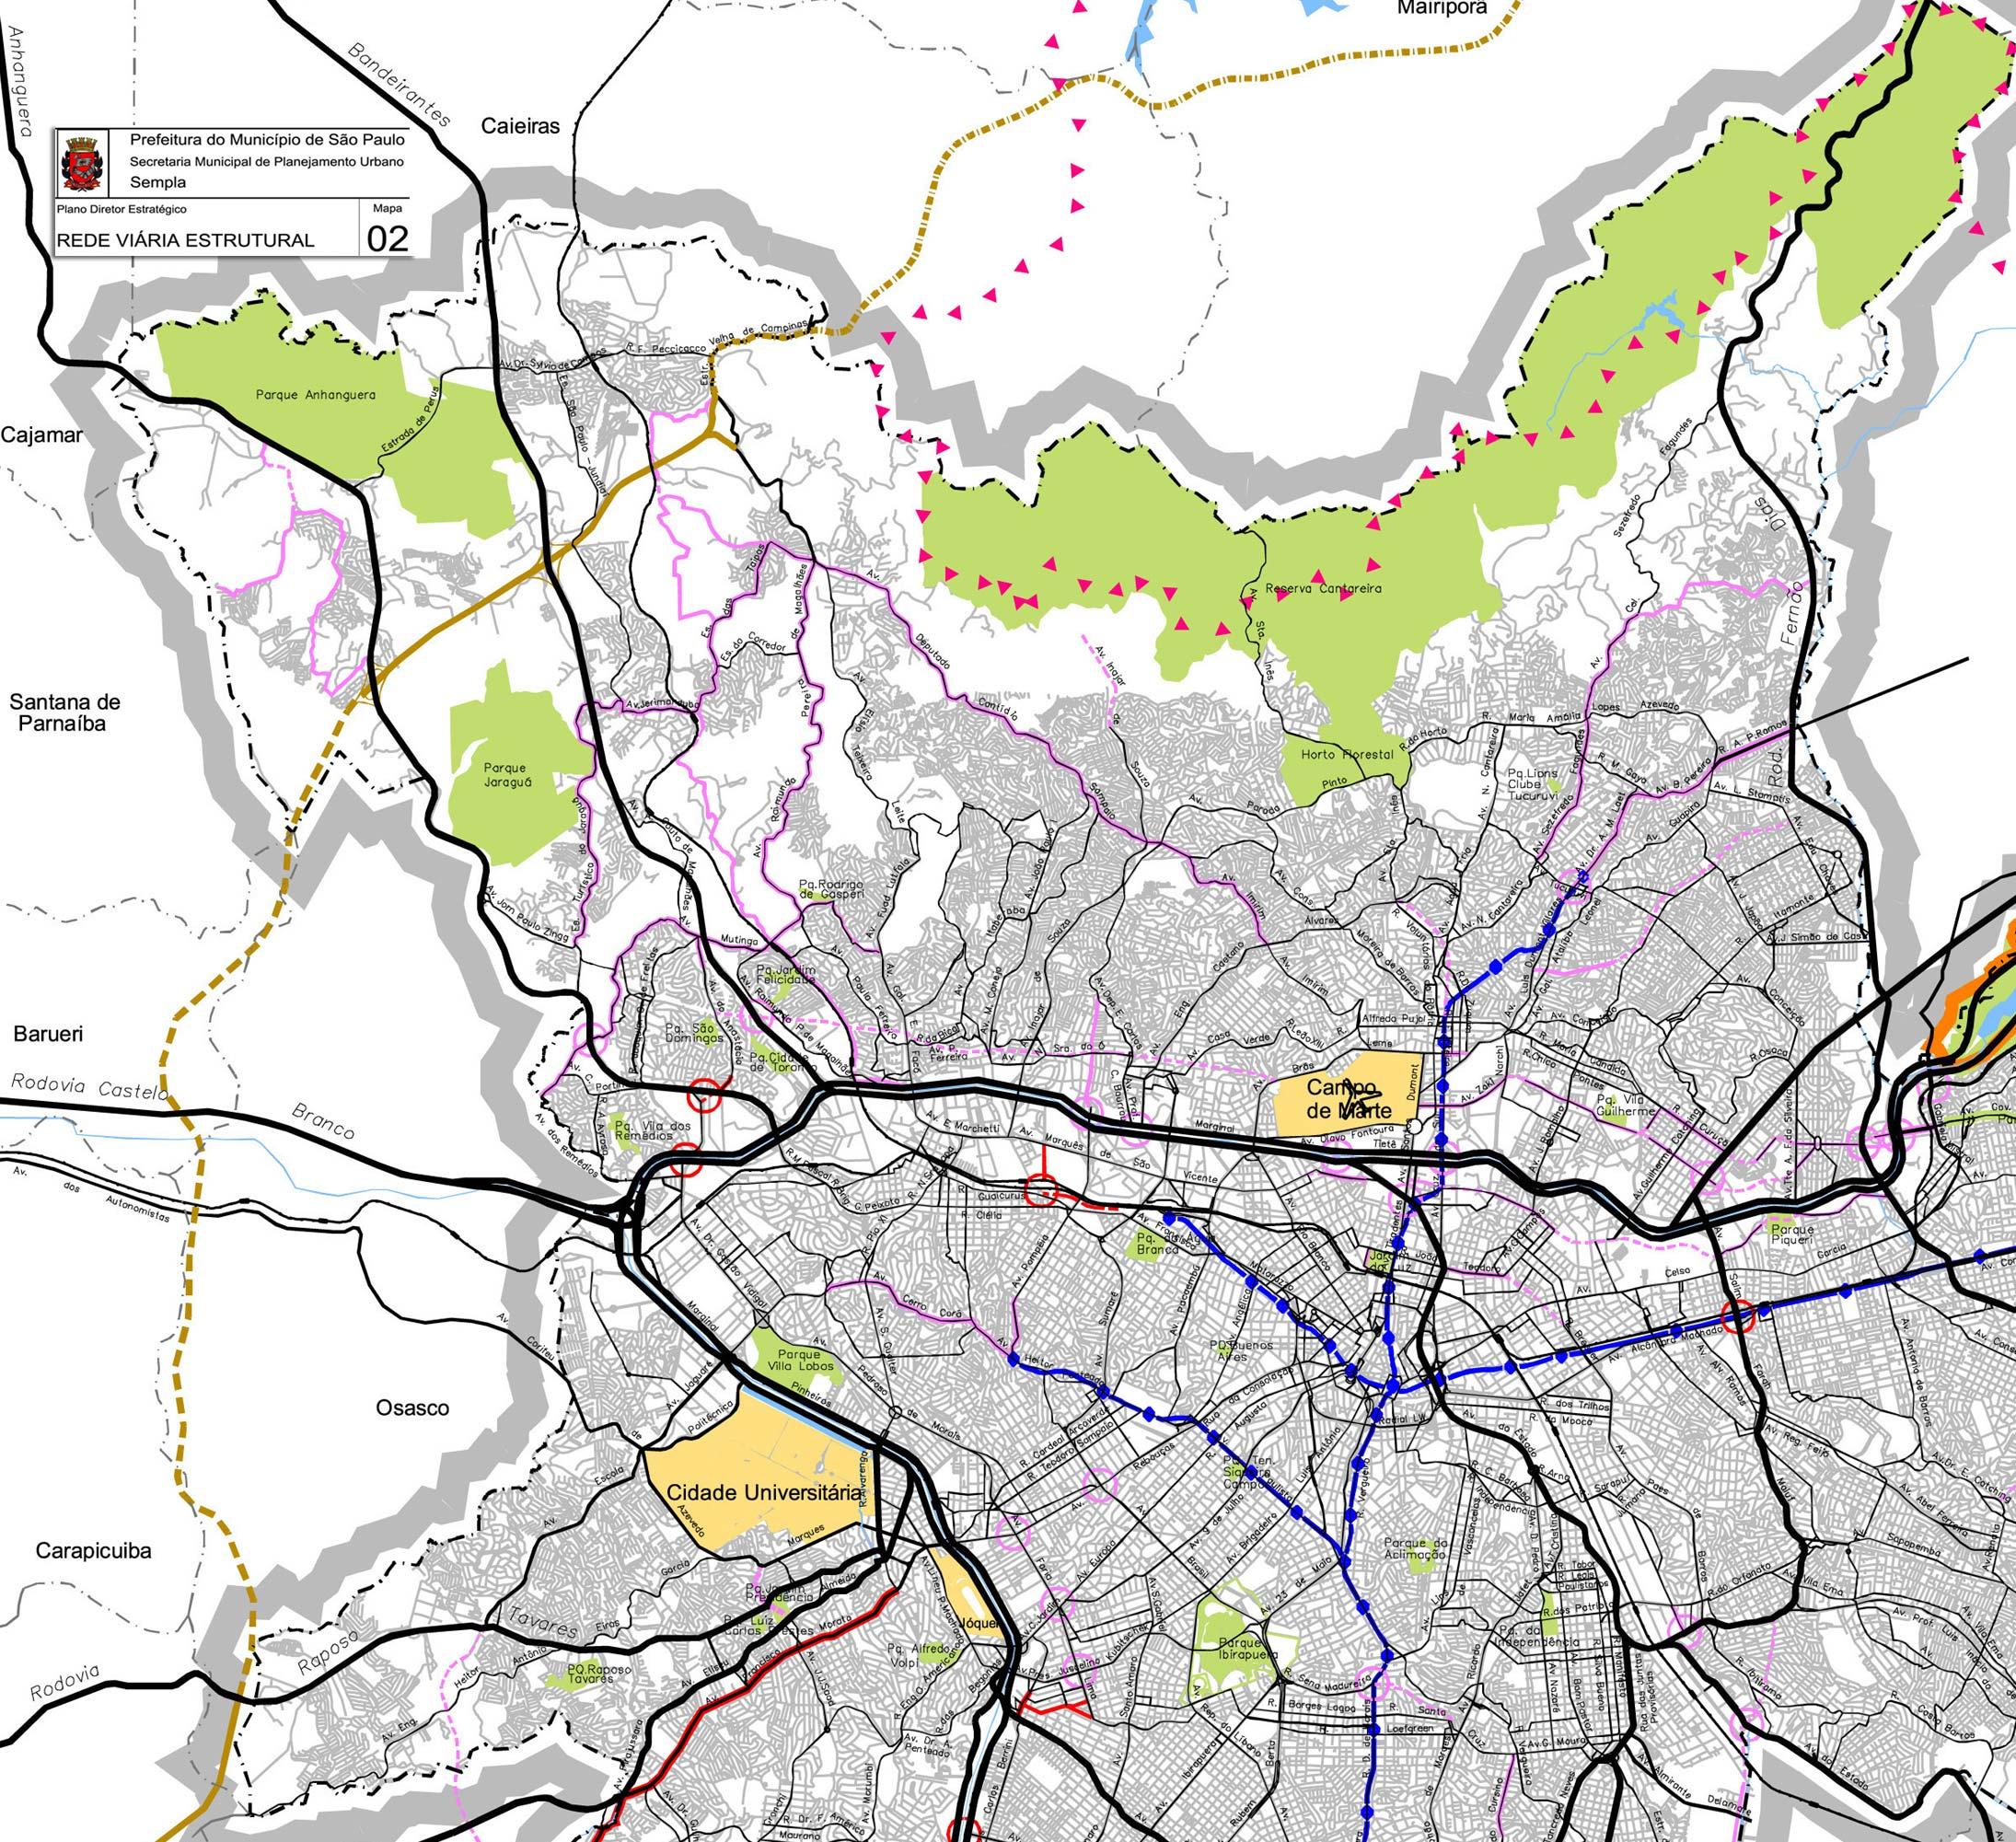 Mapa Cidade De Sao Paulo